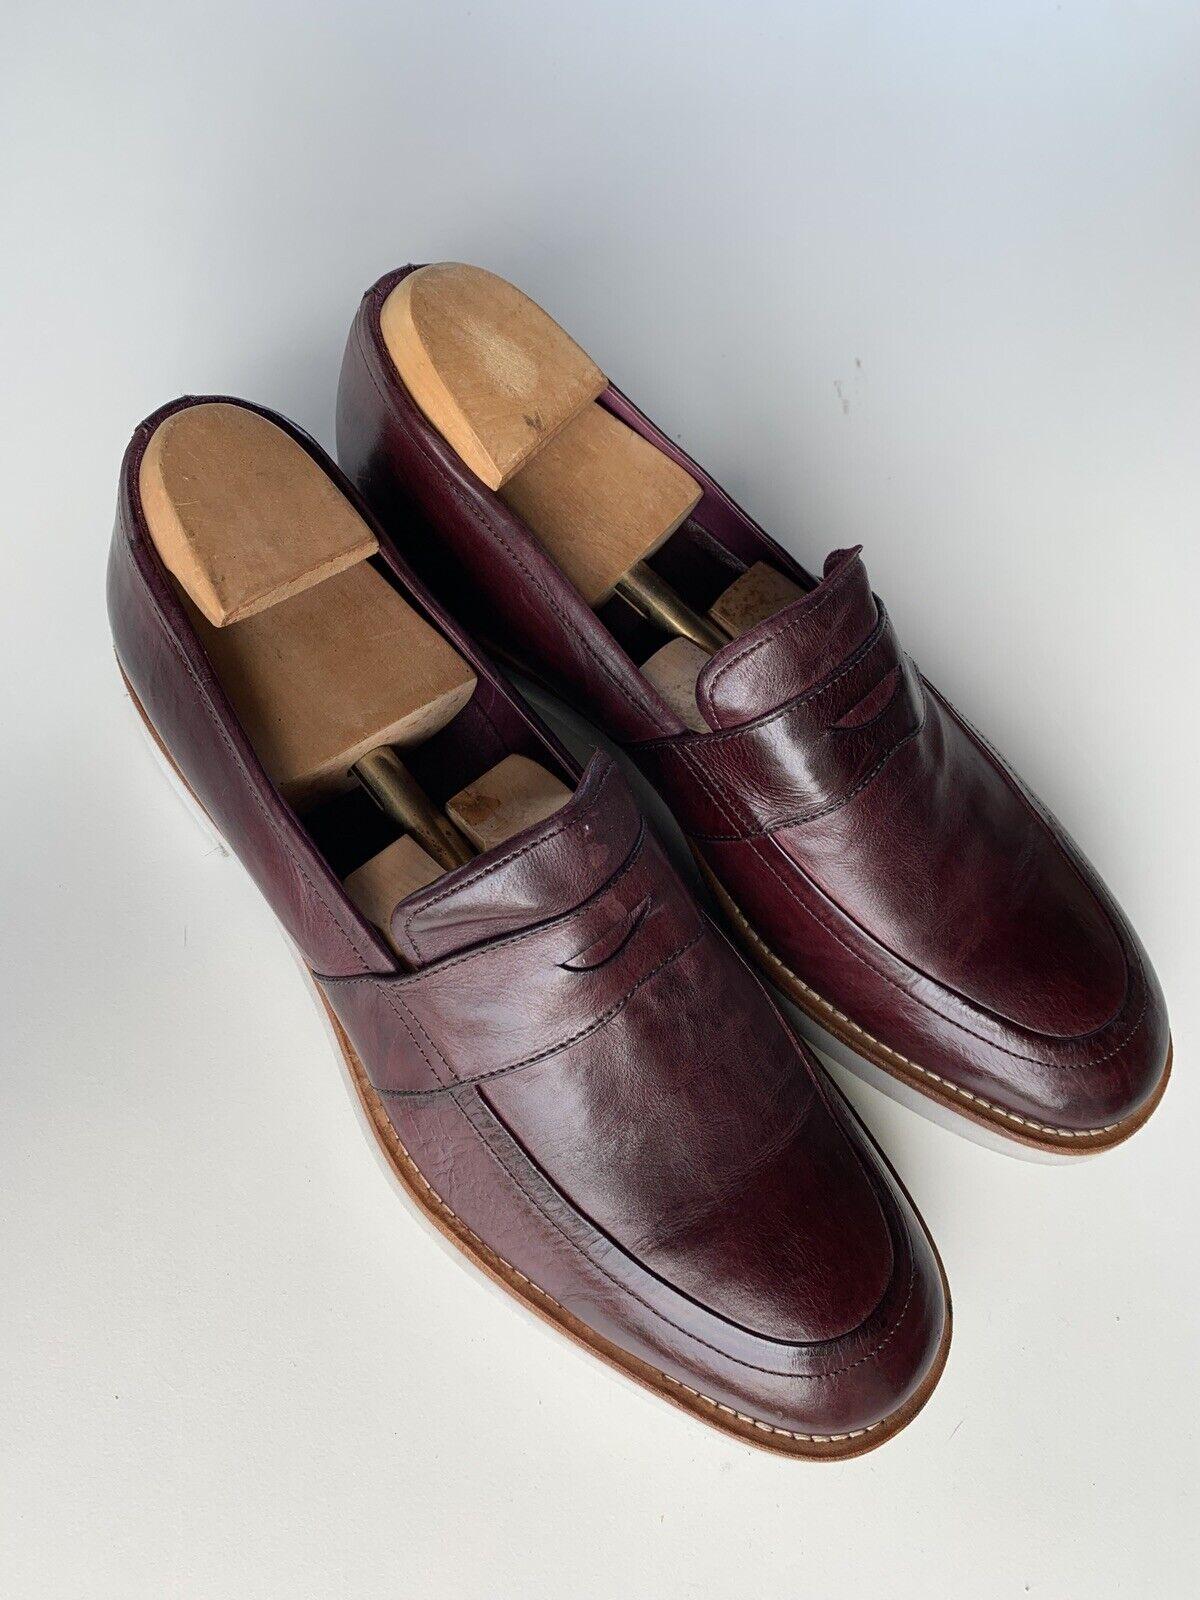 Arhommei Collezioni en cuir Penny Loafers chaussures PLUM violet UK 9 UE 44 29 cm comme neuf